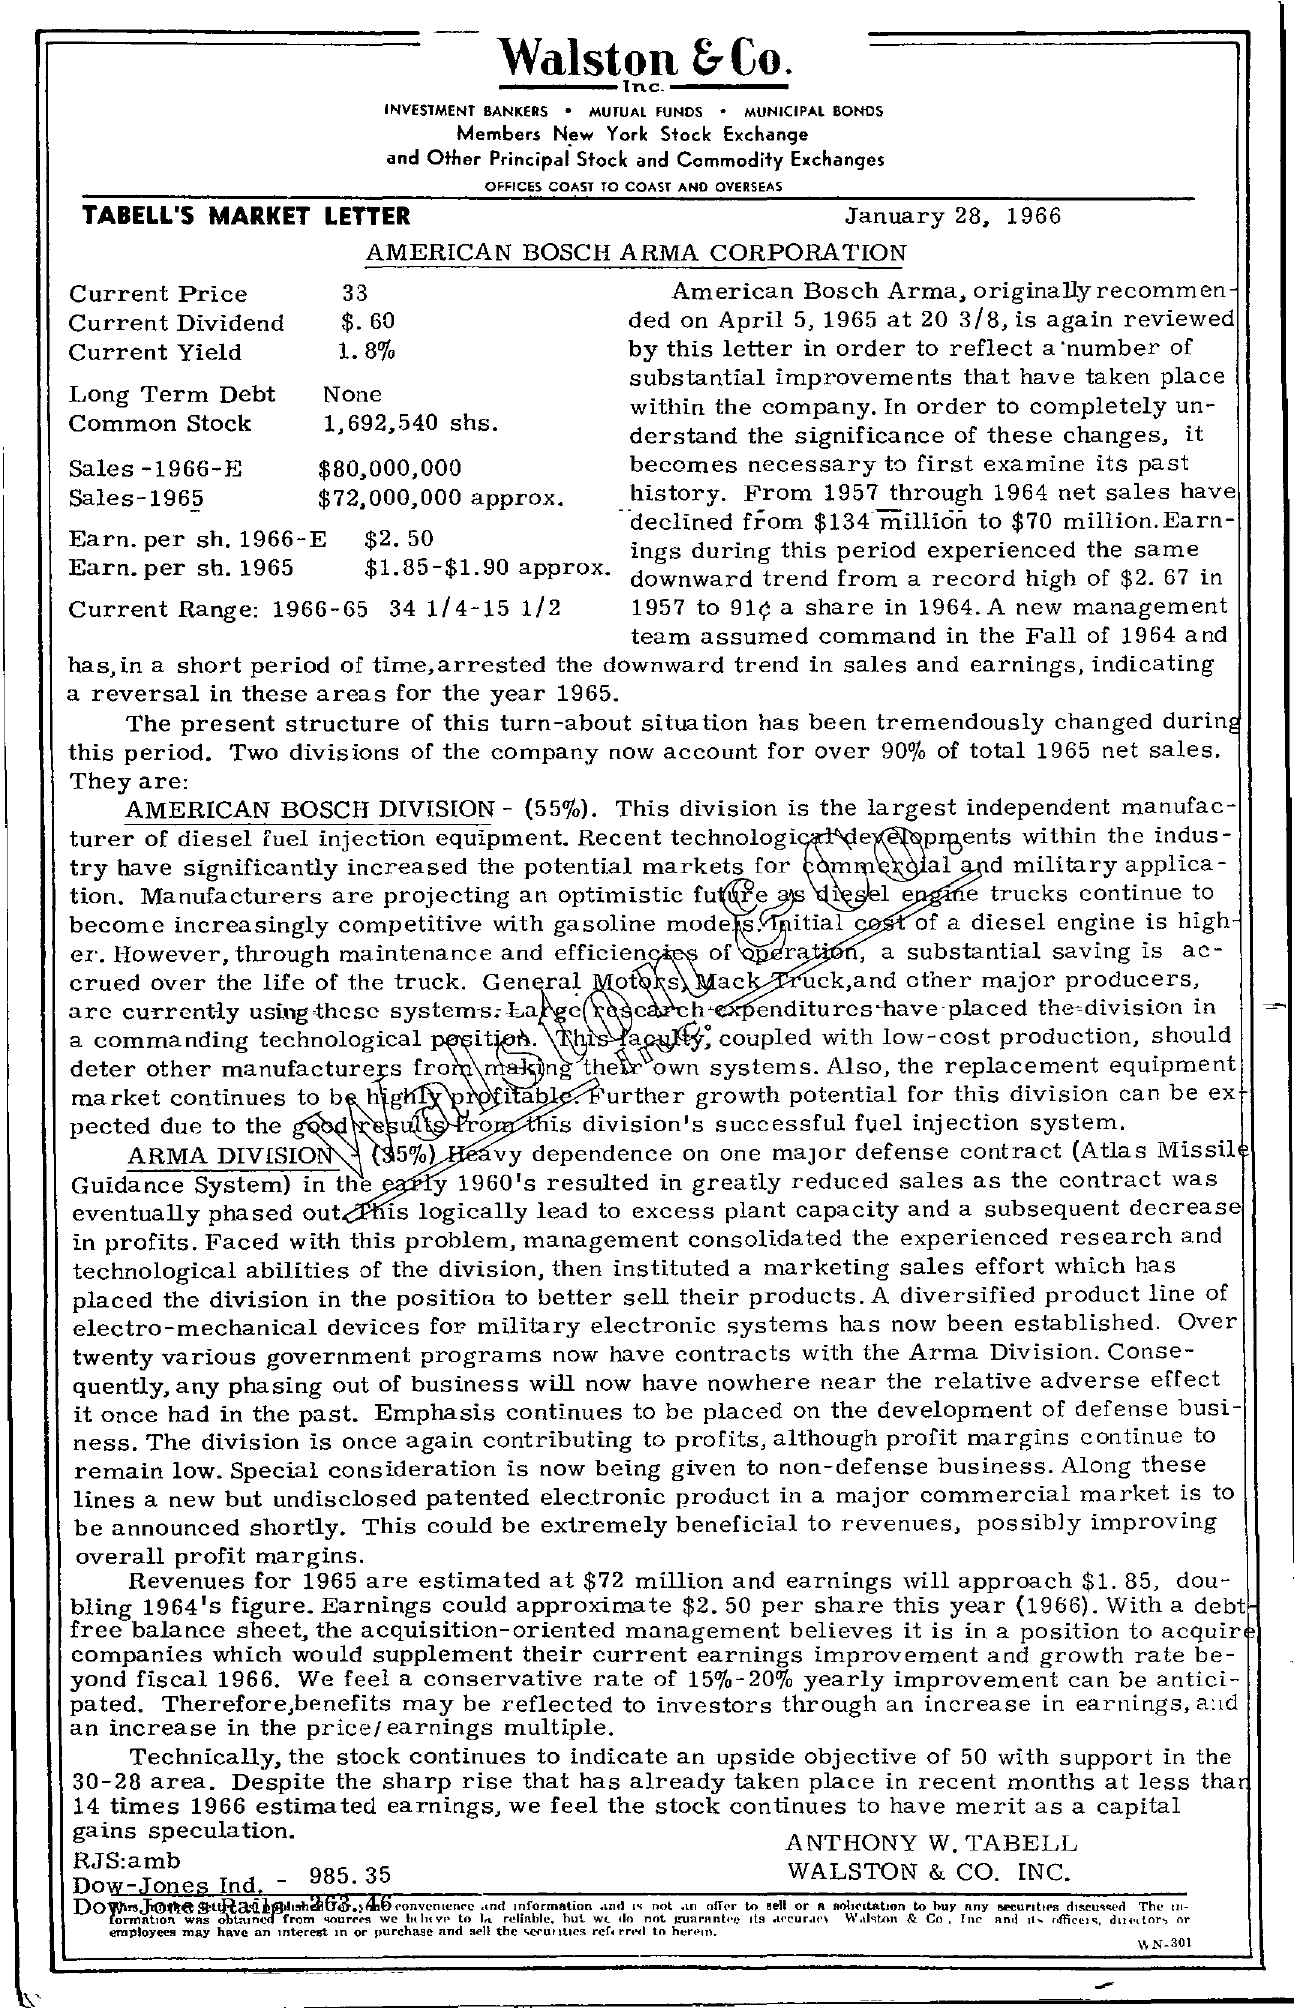 Tabell's Market Letter - January 28, 1966